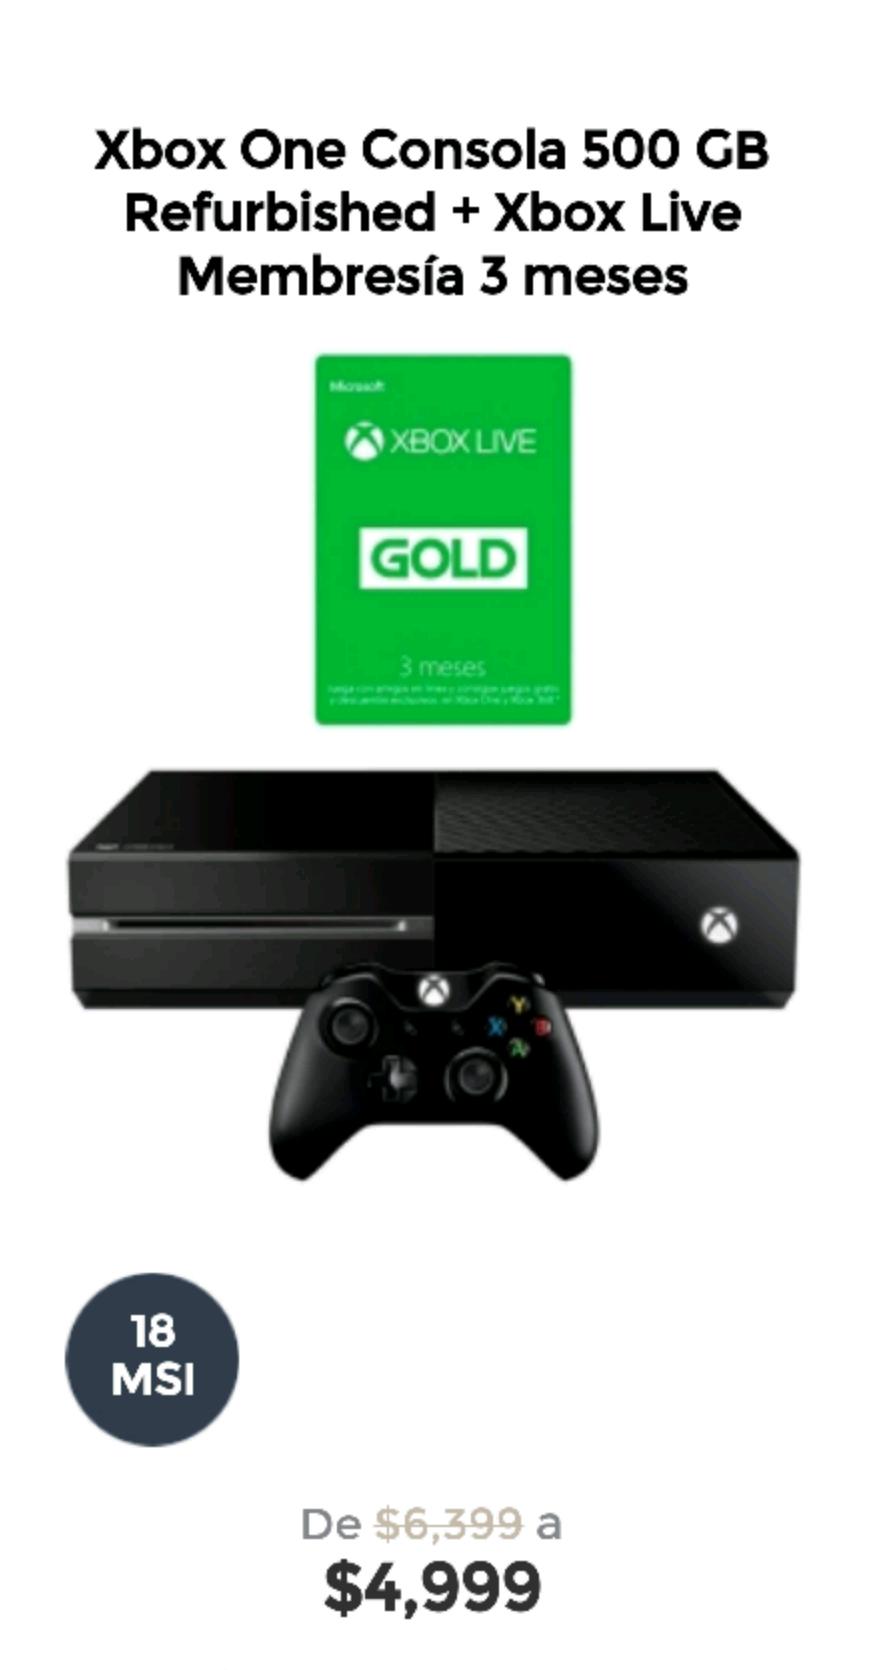 Elektra en línea:  Xbox One 500 GB Refurbished + Xbox Live Membresía 3 meses a $4,999